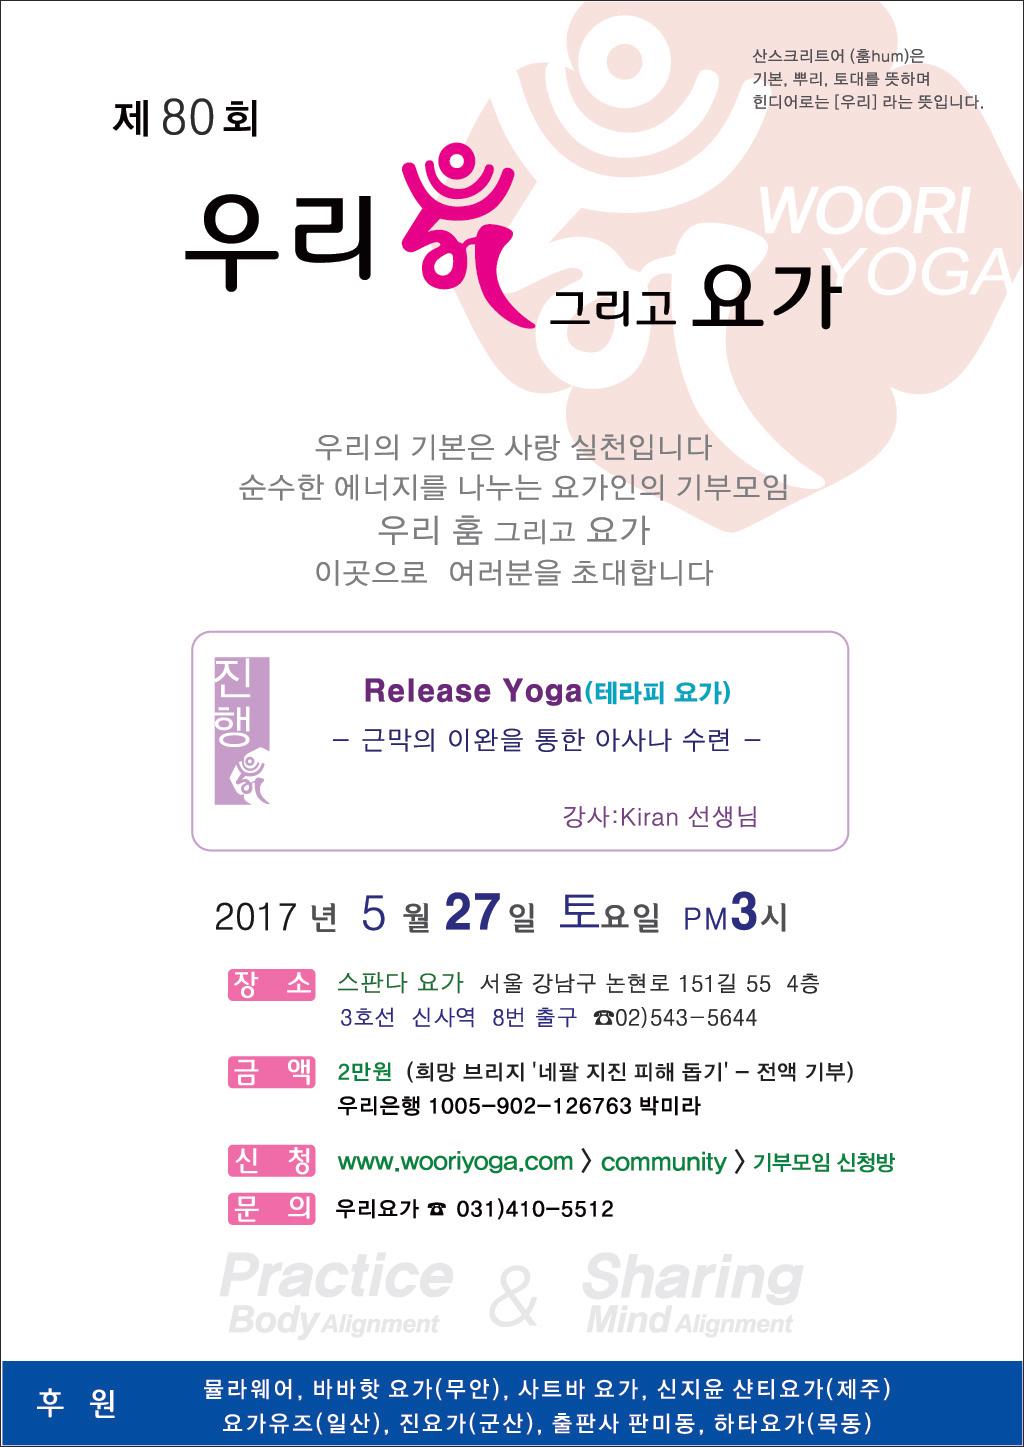 WooriHum_n_Yoga_80th_001.jpg